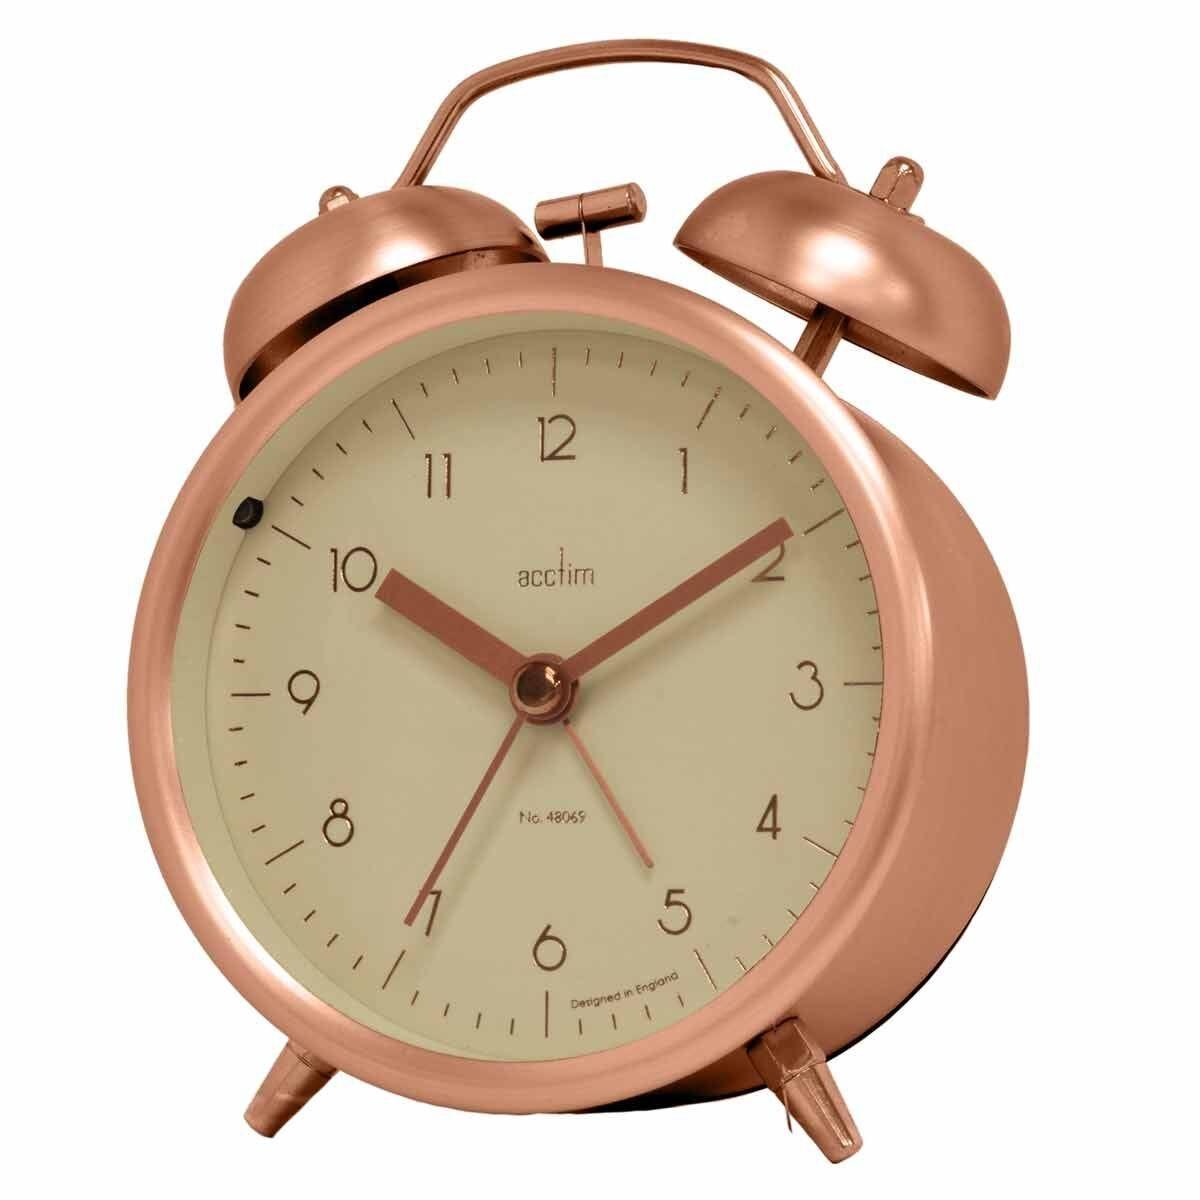 Acctim Aksel Double Bell Alarm Clock